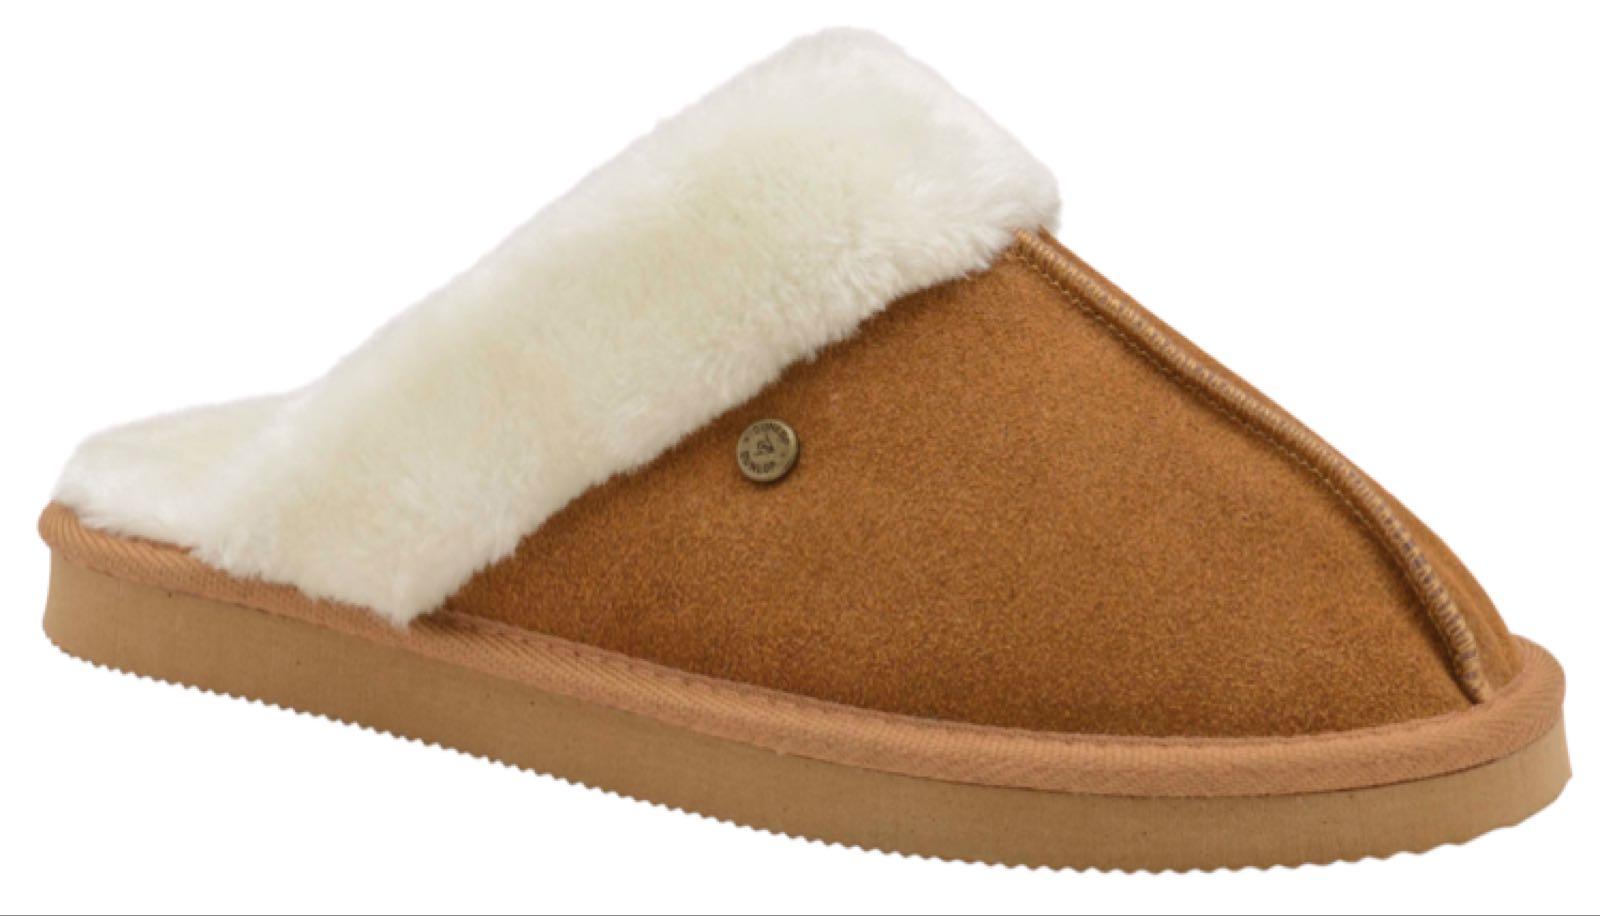 Dunlop Slippers Janie Tan